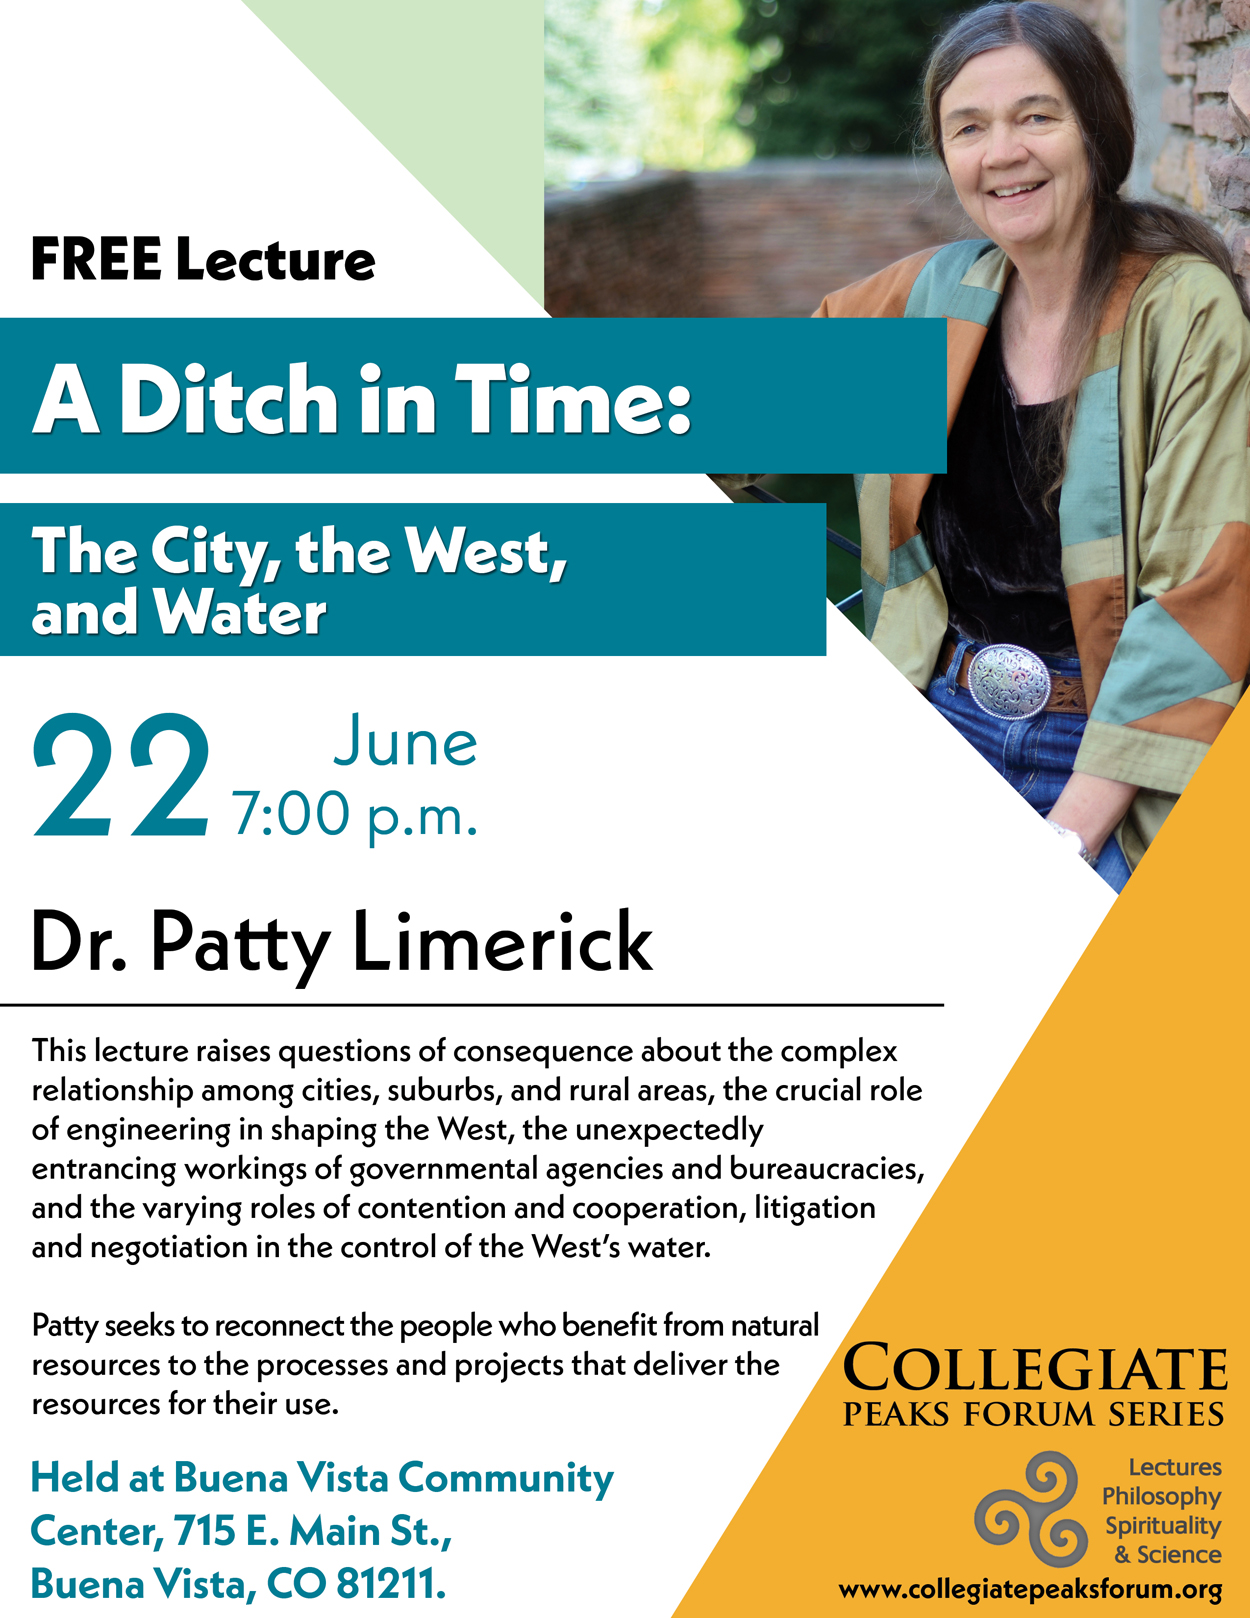 June 22, 2017 Dr. Patty Limerick